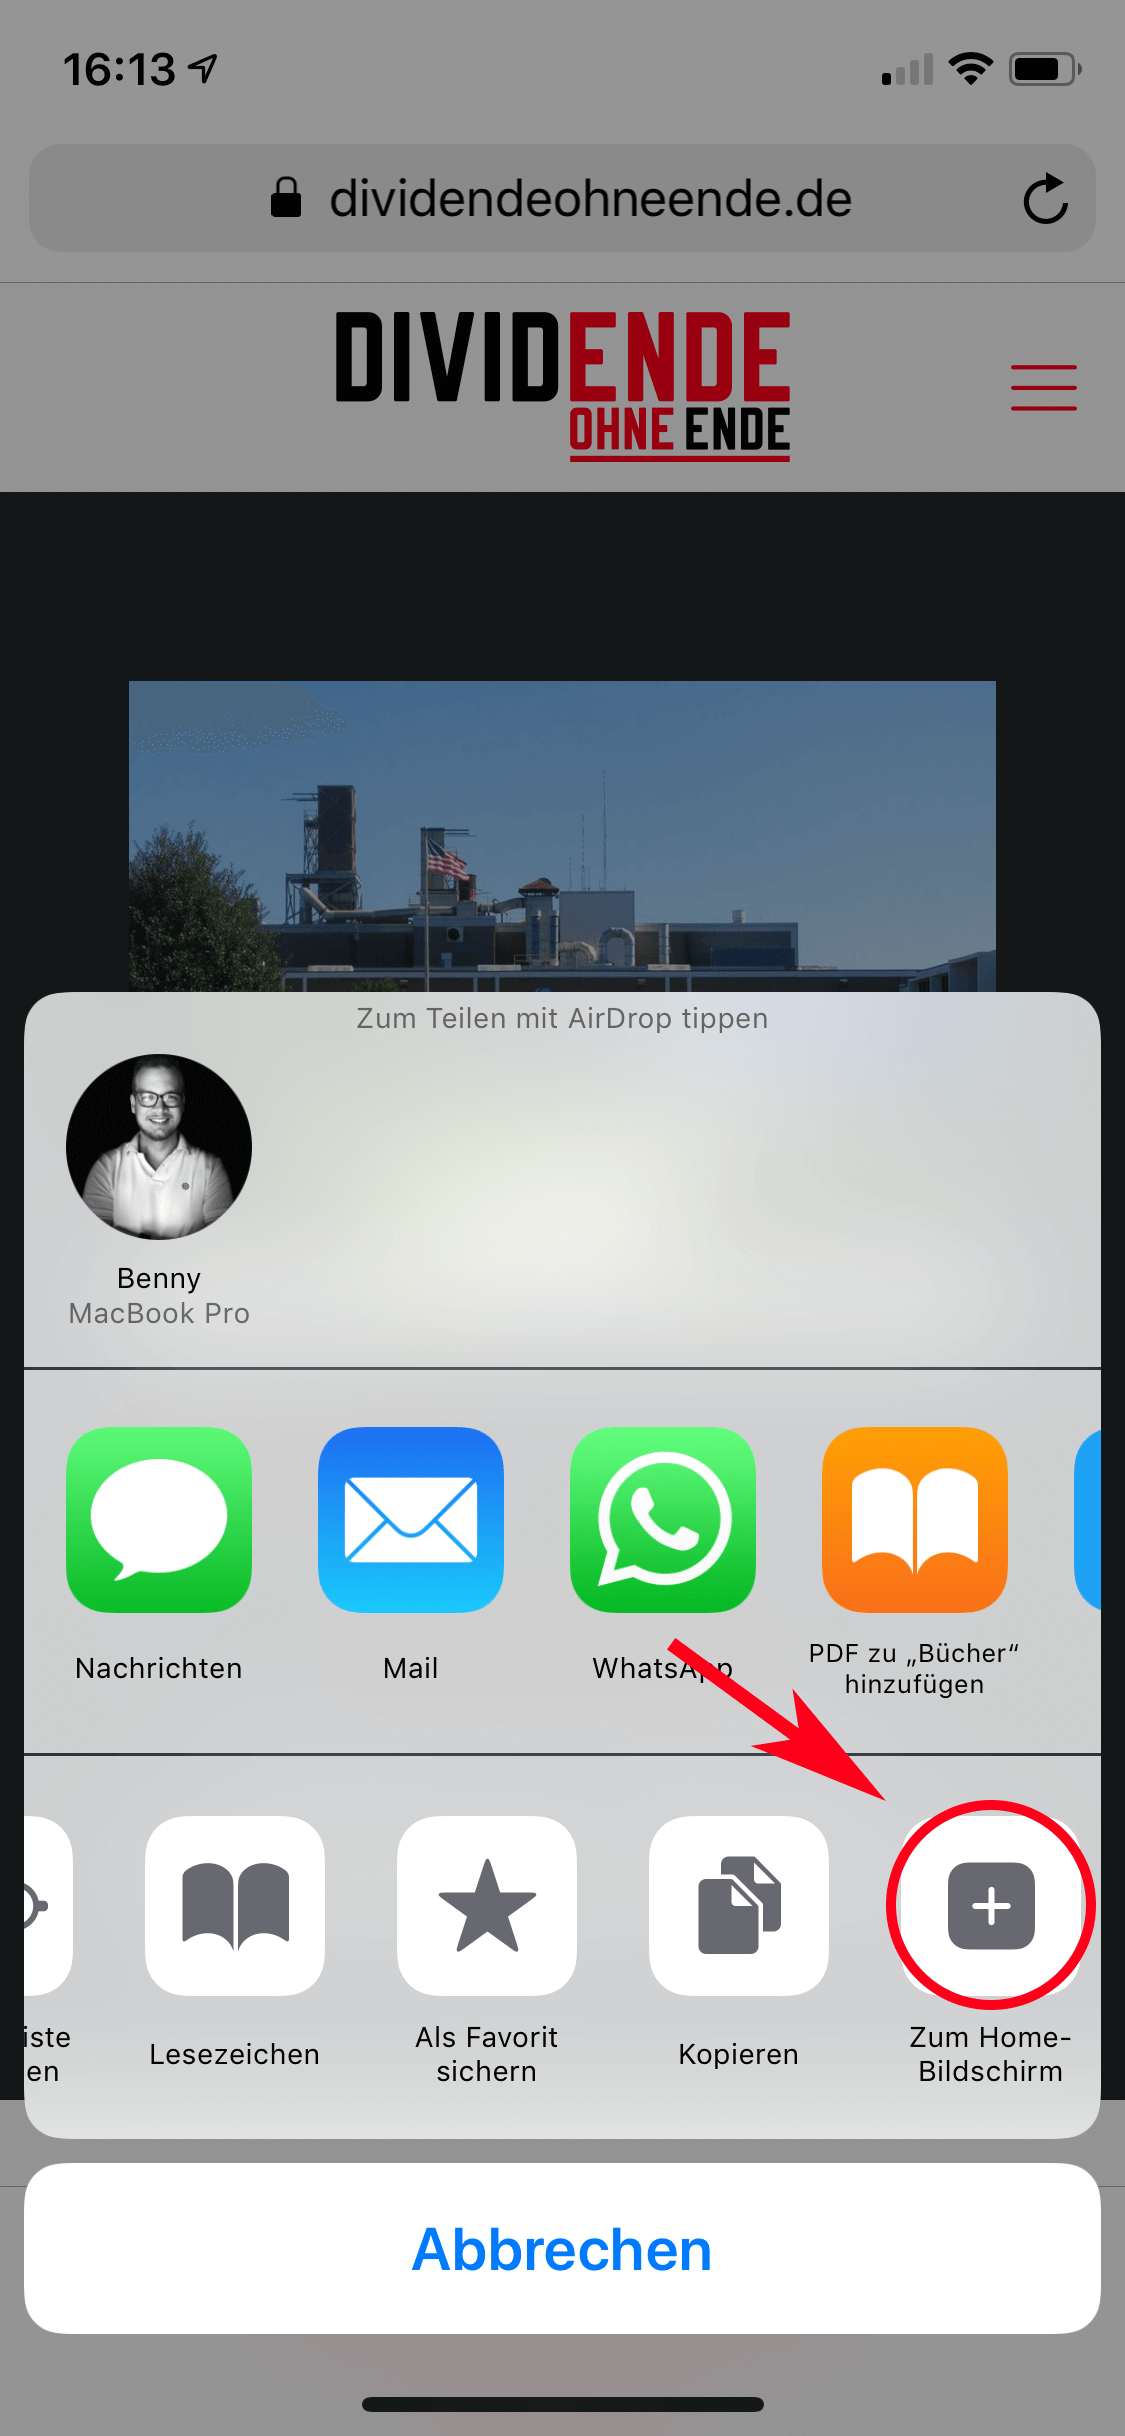 DividendeOhneEnde_App_iOS_2